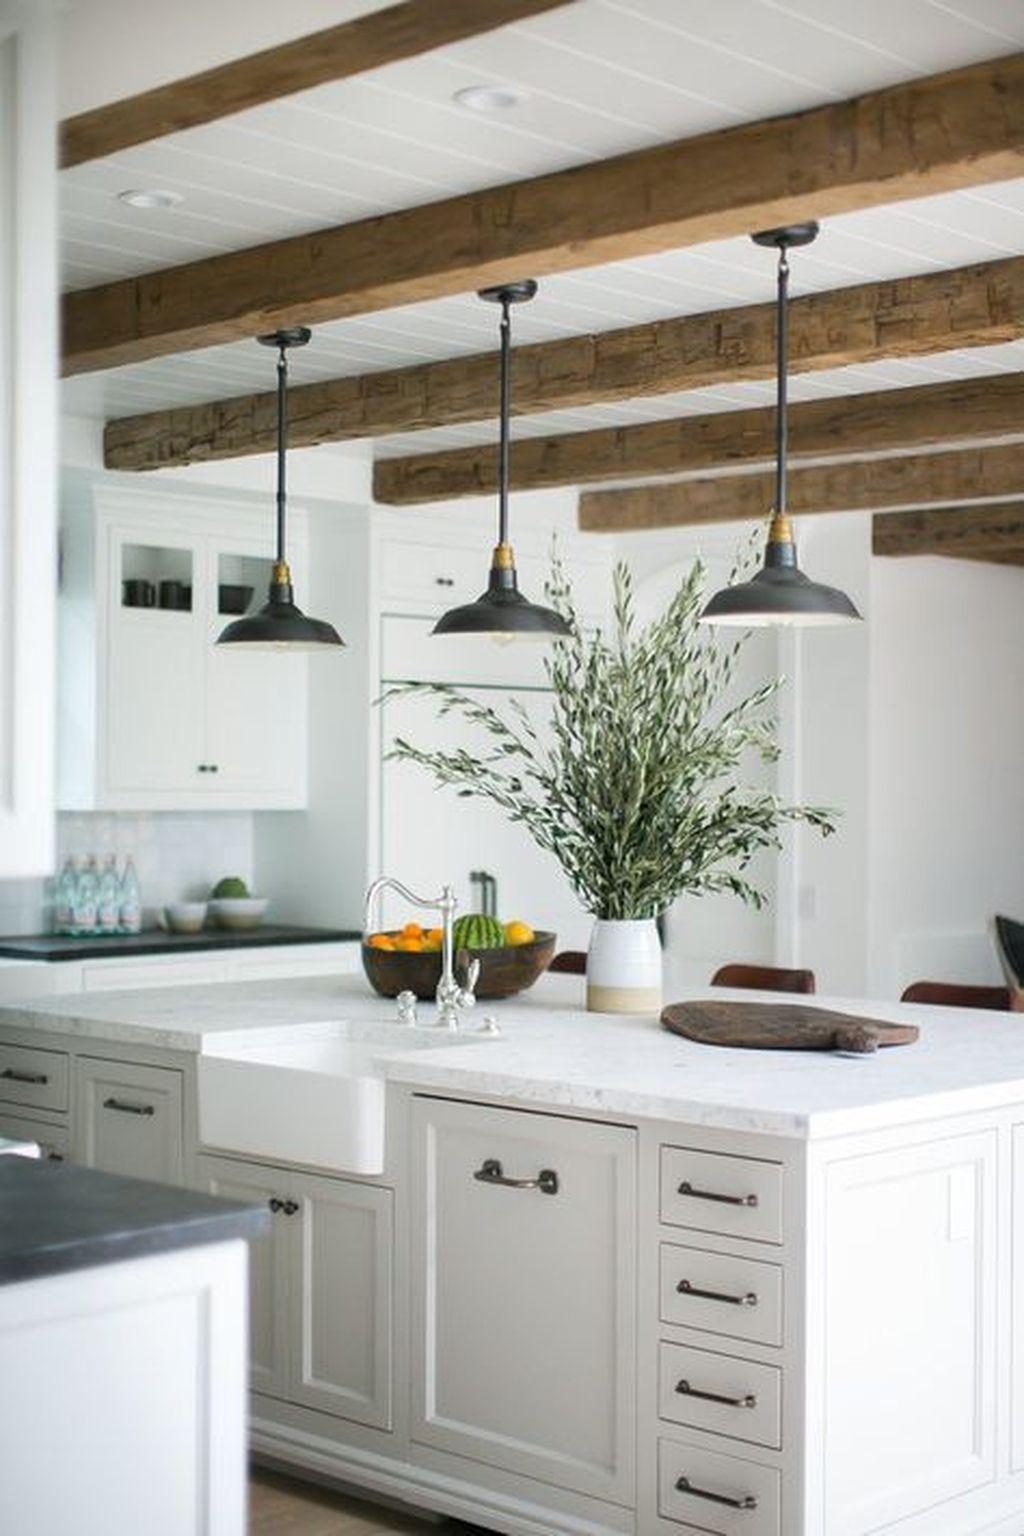 Wonderful Kitchen Lighting Ideas To Make It Look More Beautiful 21